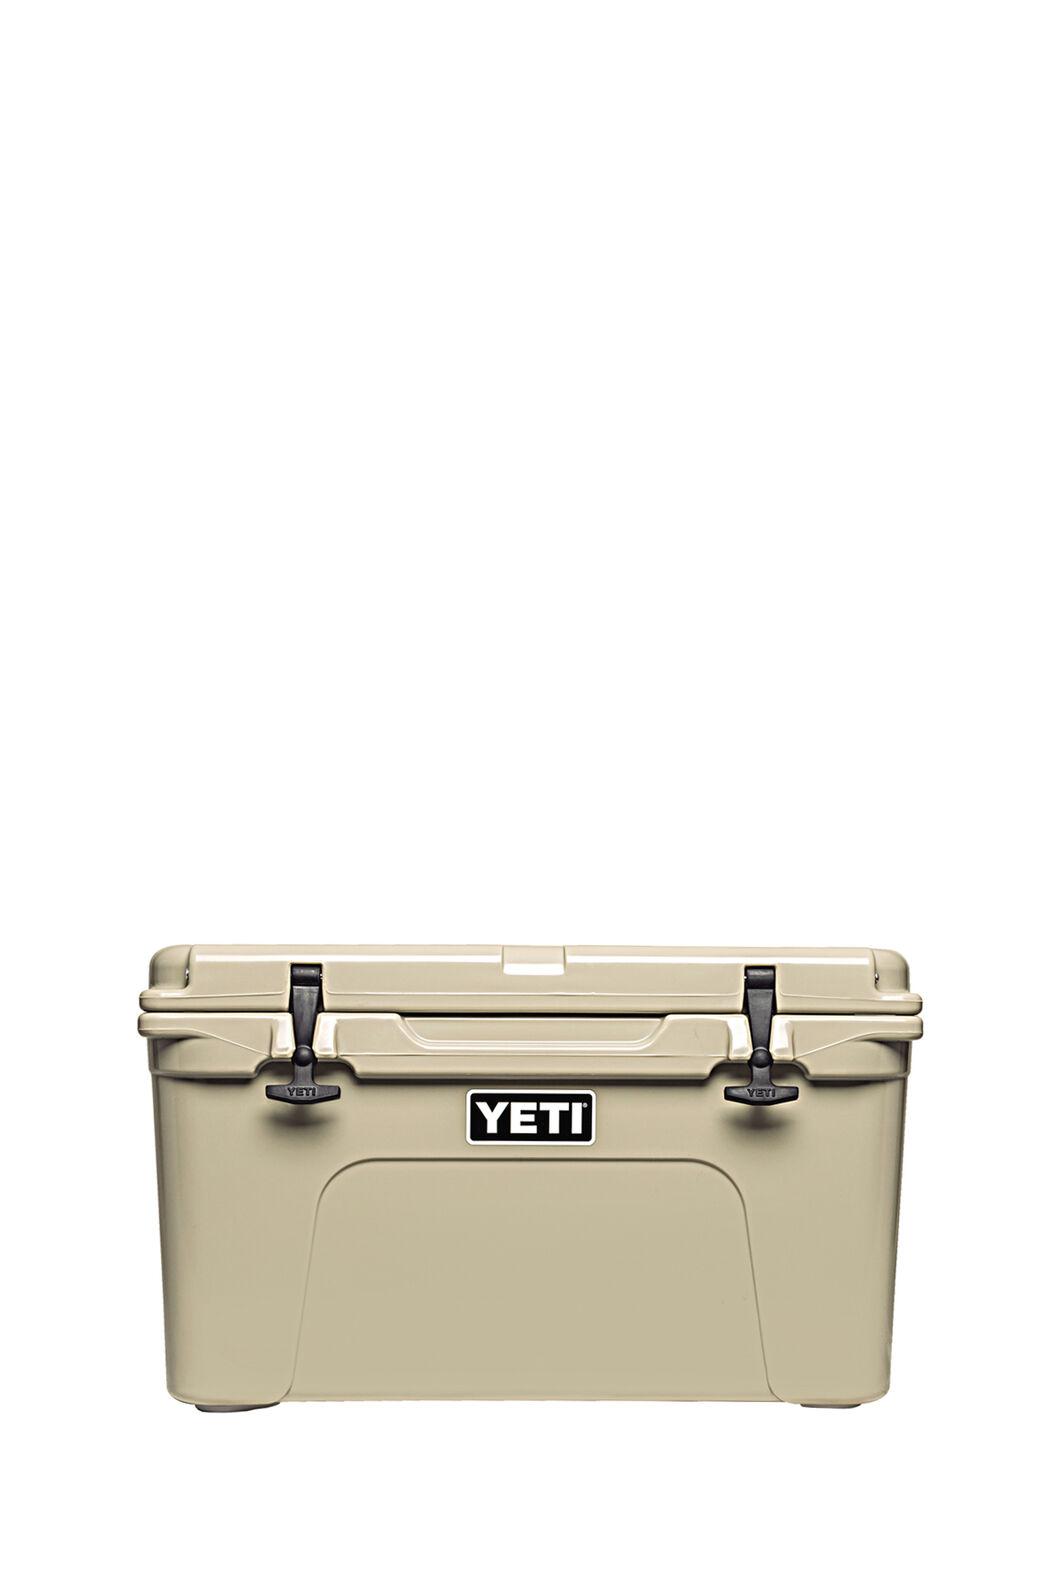 YETI® Tundra 45L Hard Cooler, Tan, hi-res